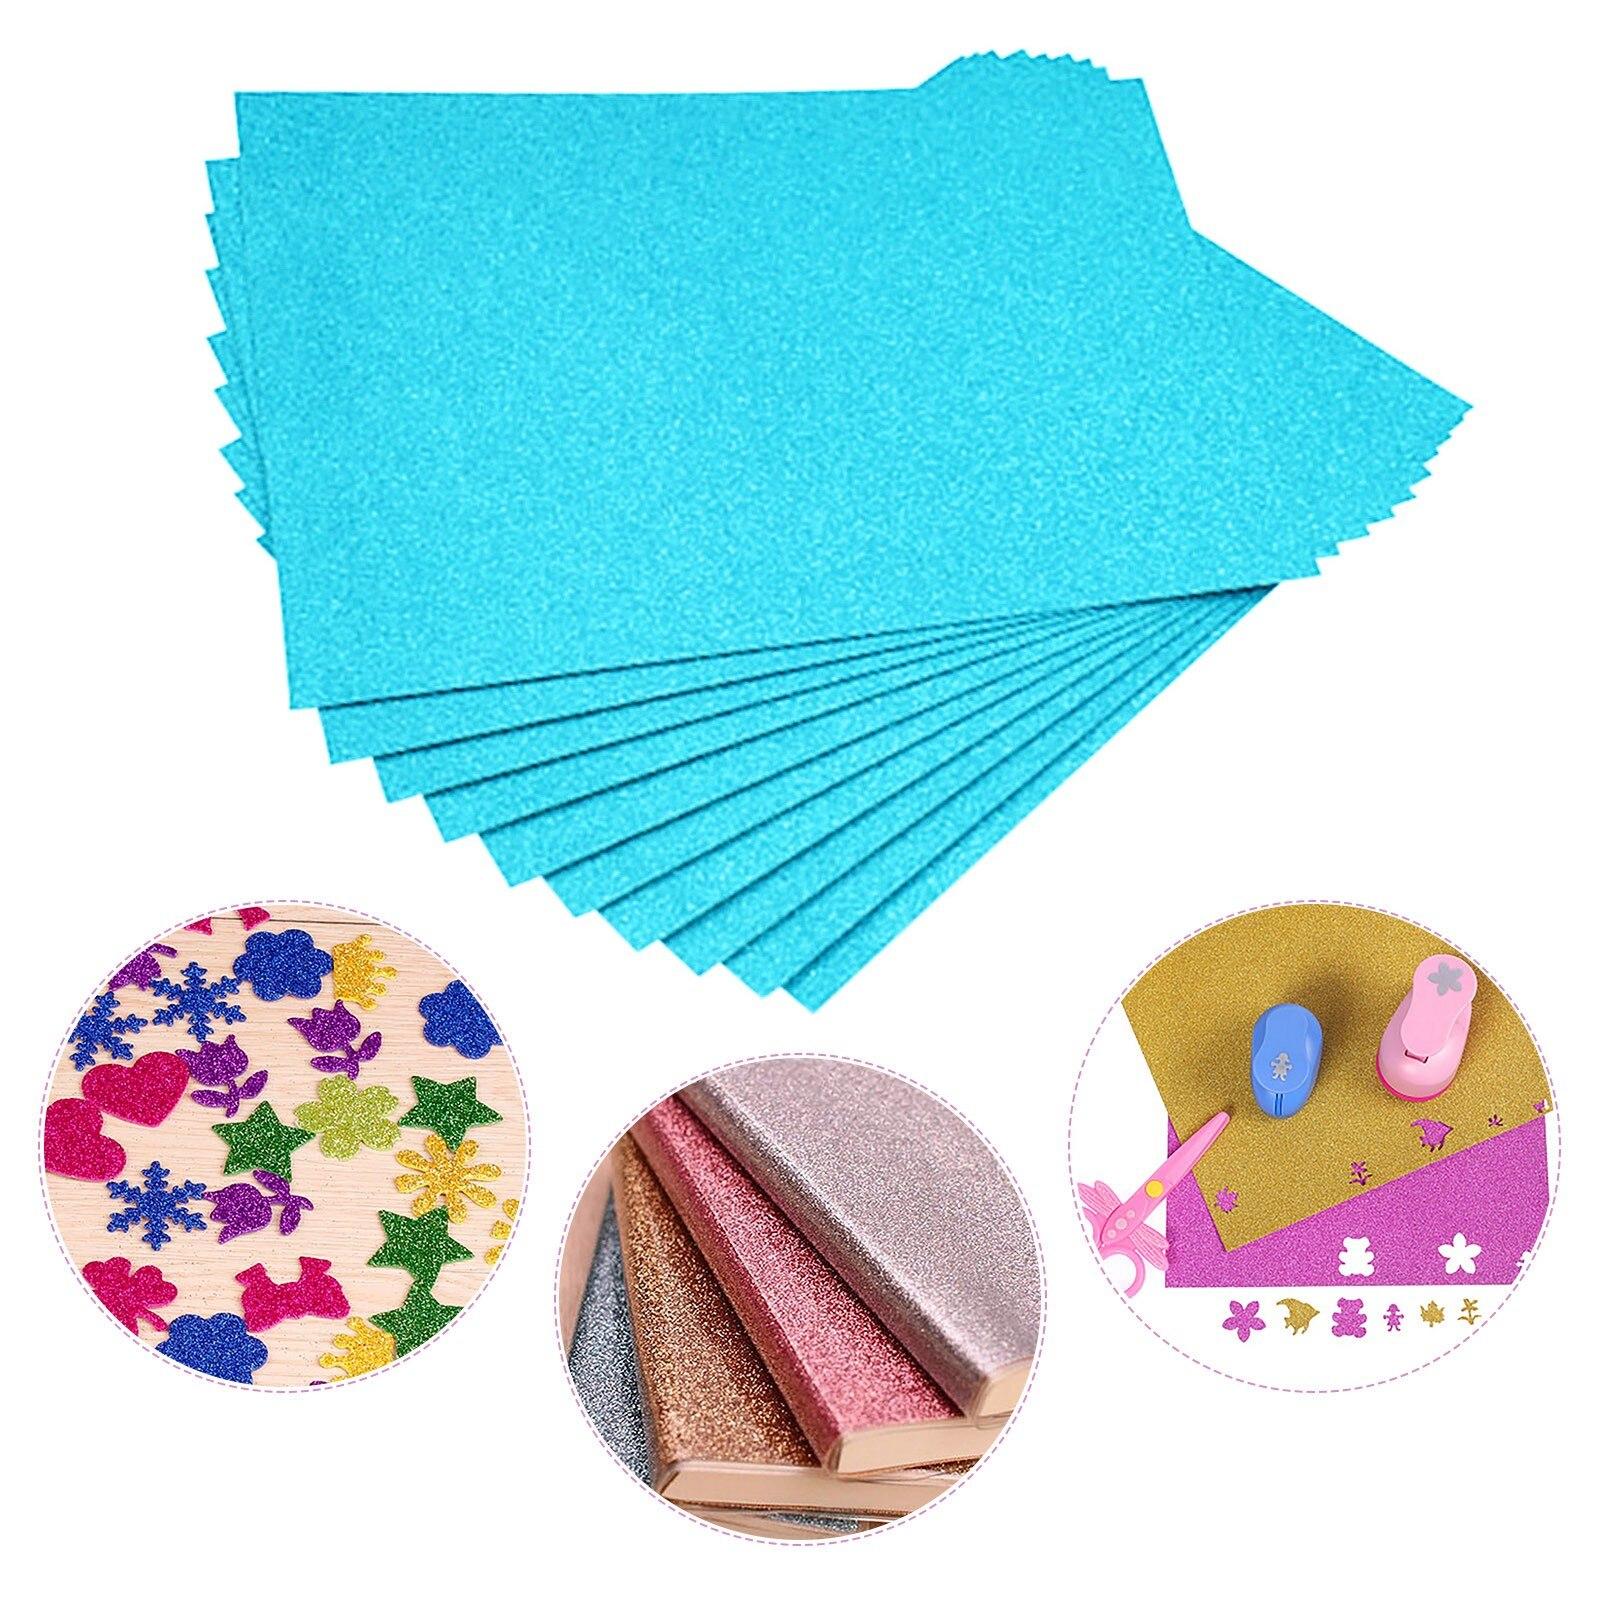 Sky Blue Glitter Cardstock Flash Card Paper Flash Shiny Craft Paper Advanced A4 Flash Paper Flash Shiny Craft Paper No Adhesive